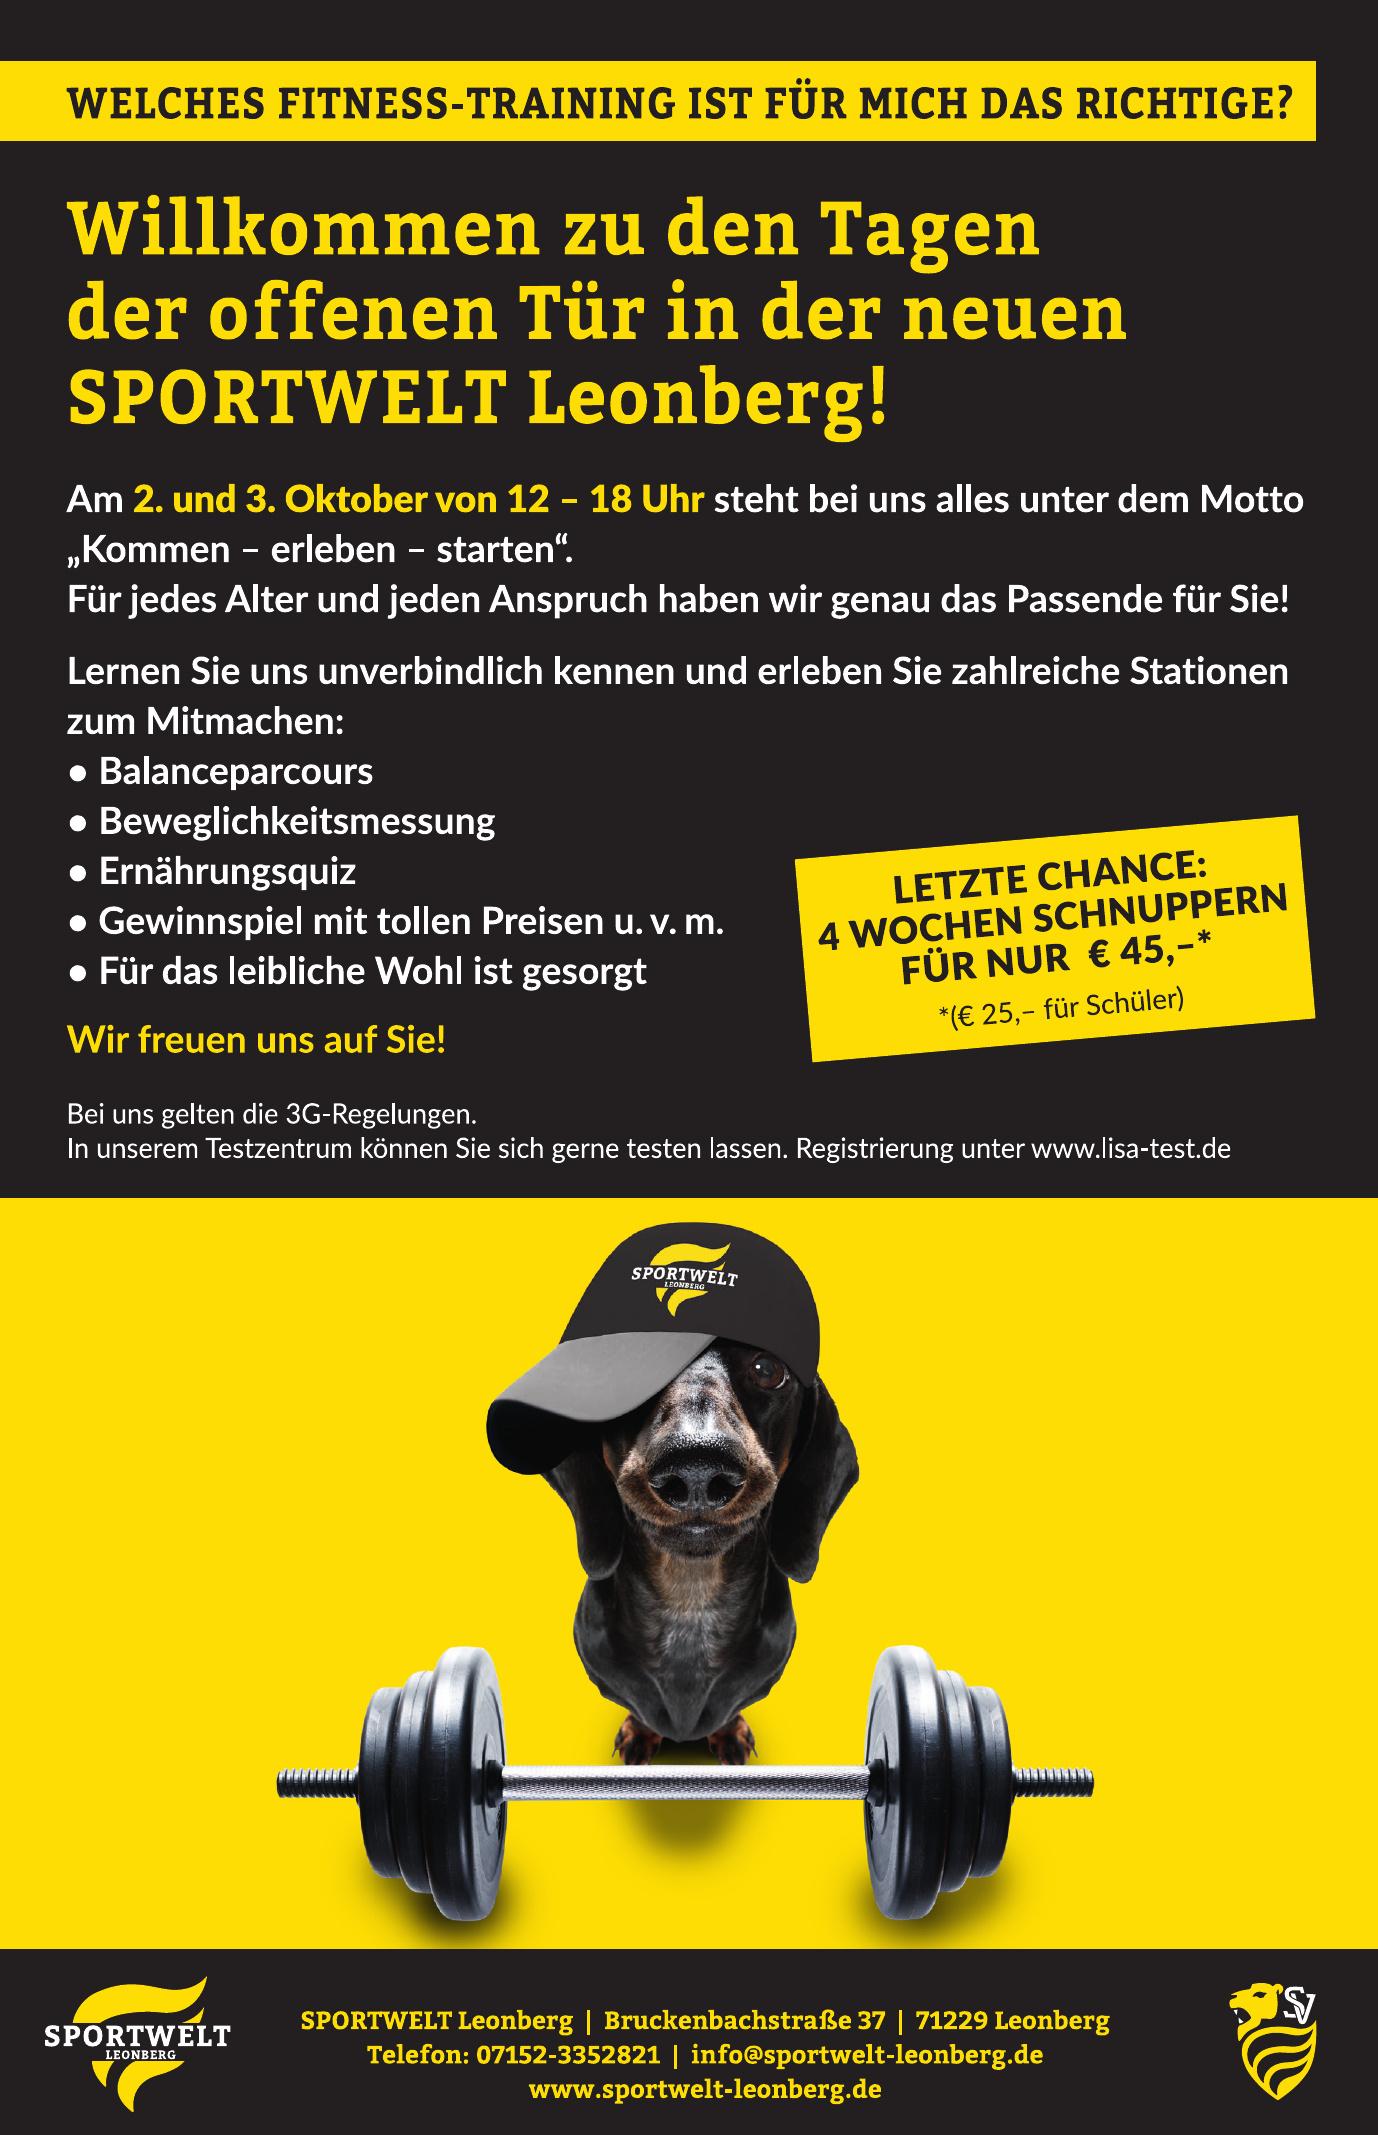 Sportwelt Leonberg